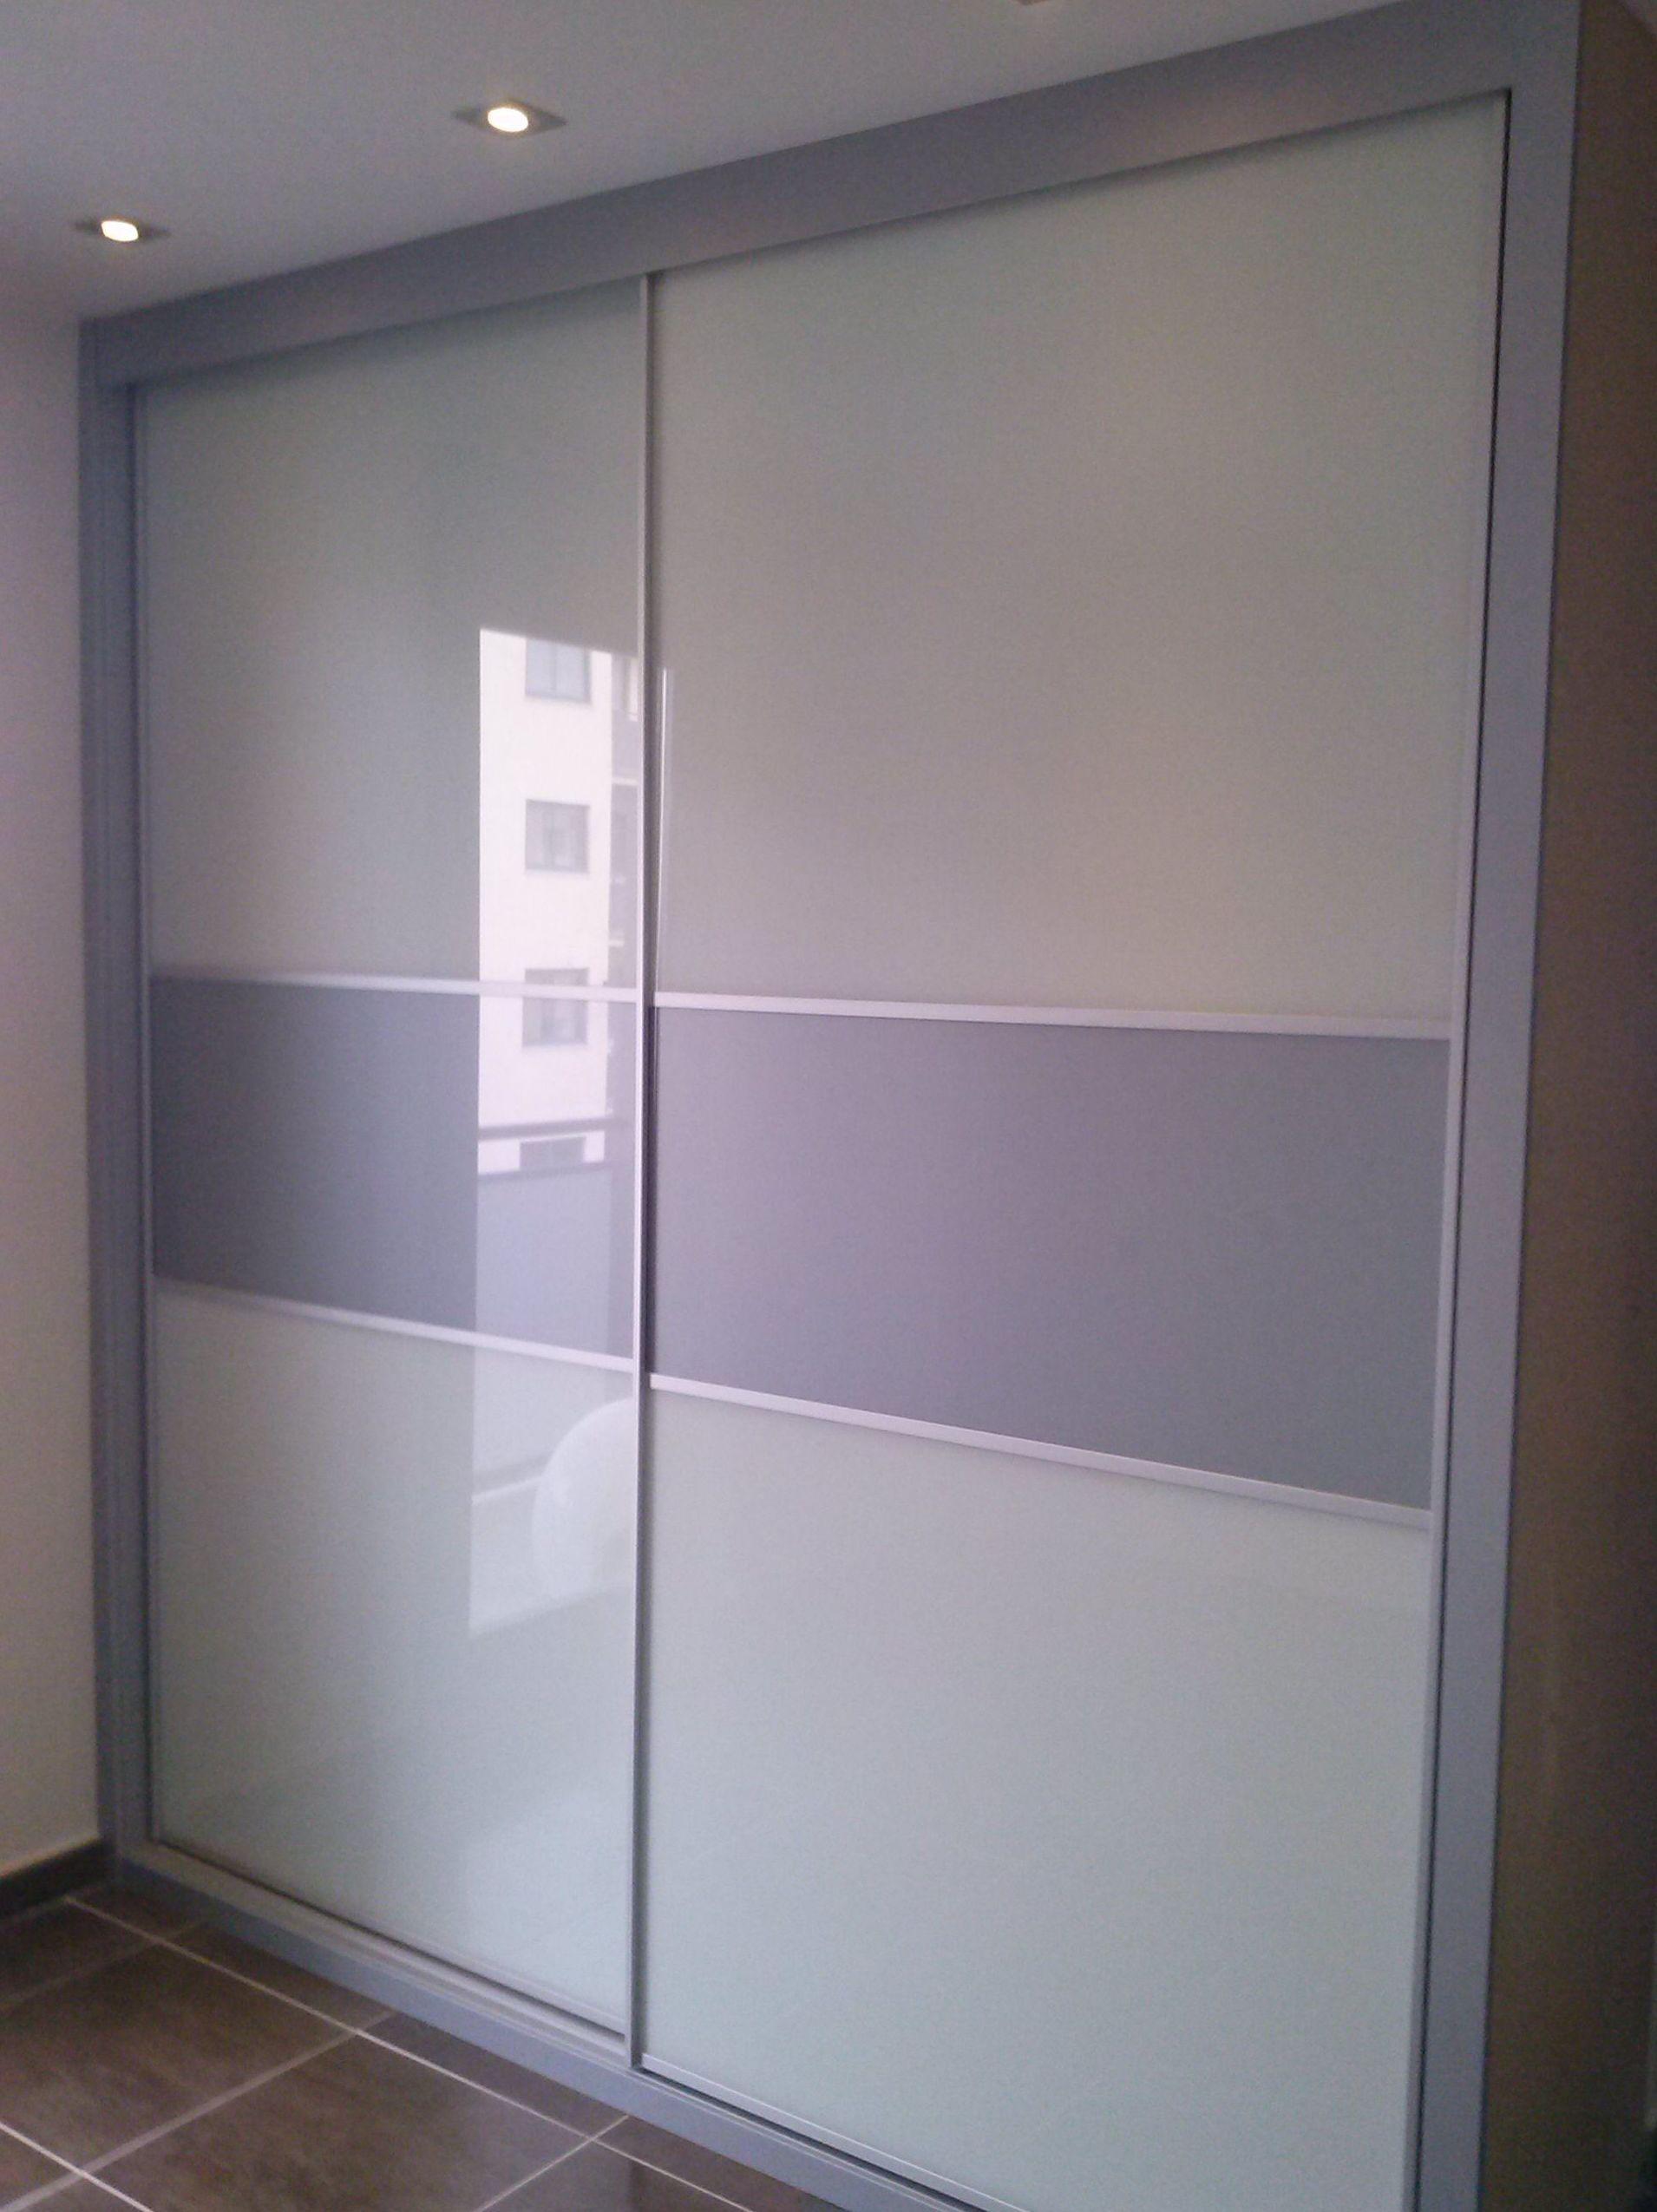 Armarios empotrados blancos latest en dos frentes with for Puertas acristaladas interior